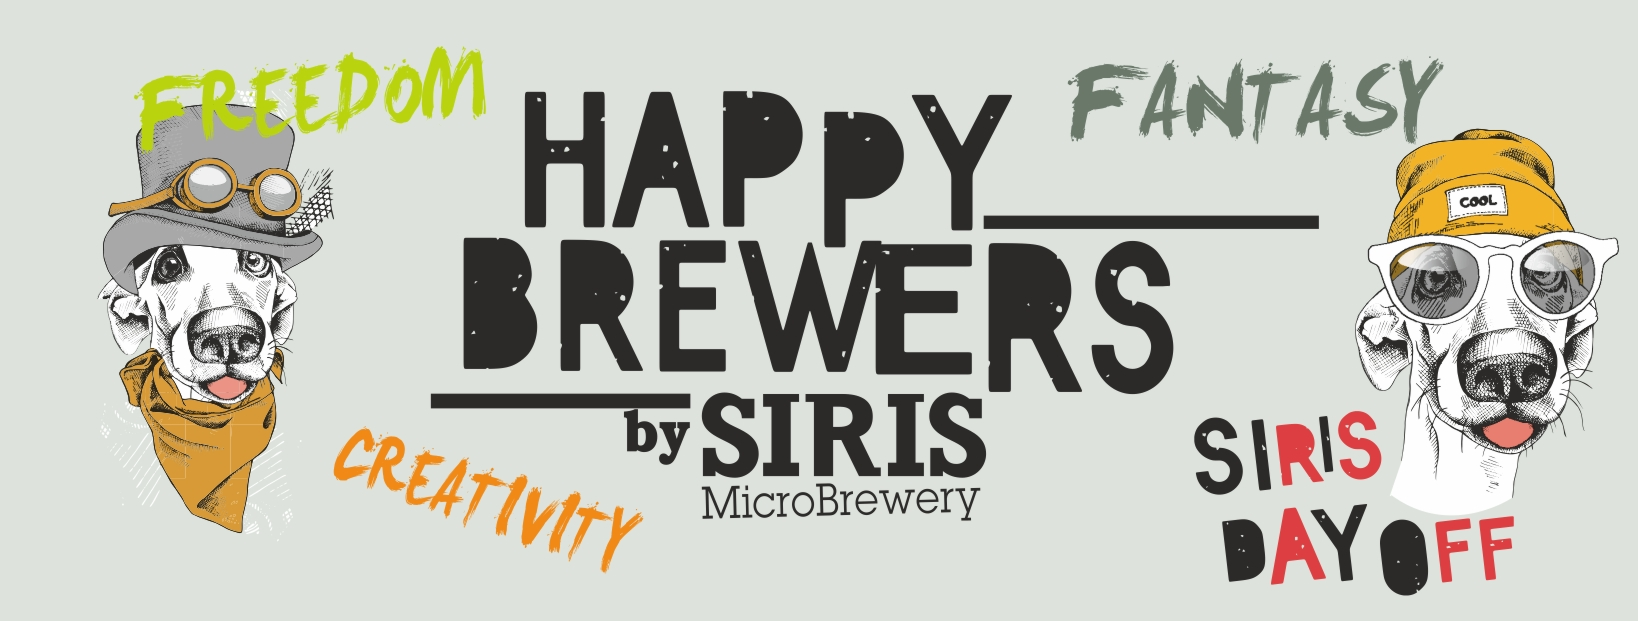 Siris MicroΒrewery | Μικροζυθοποιία Σερρών & Β. Ελλάδος Ε.Ε.